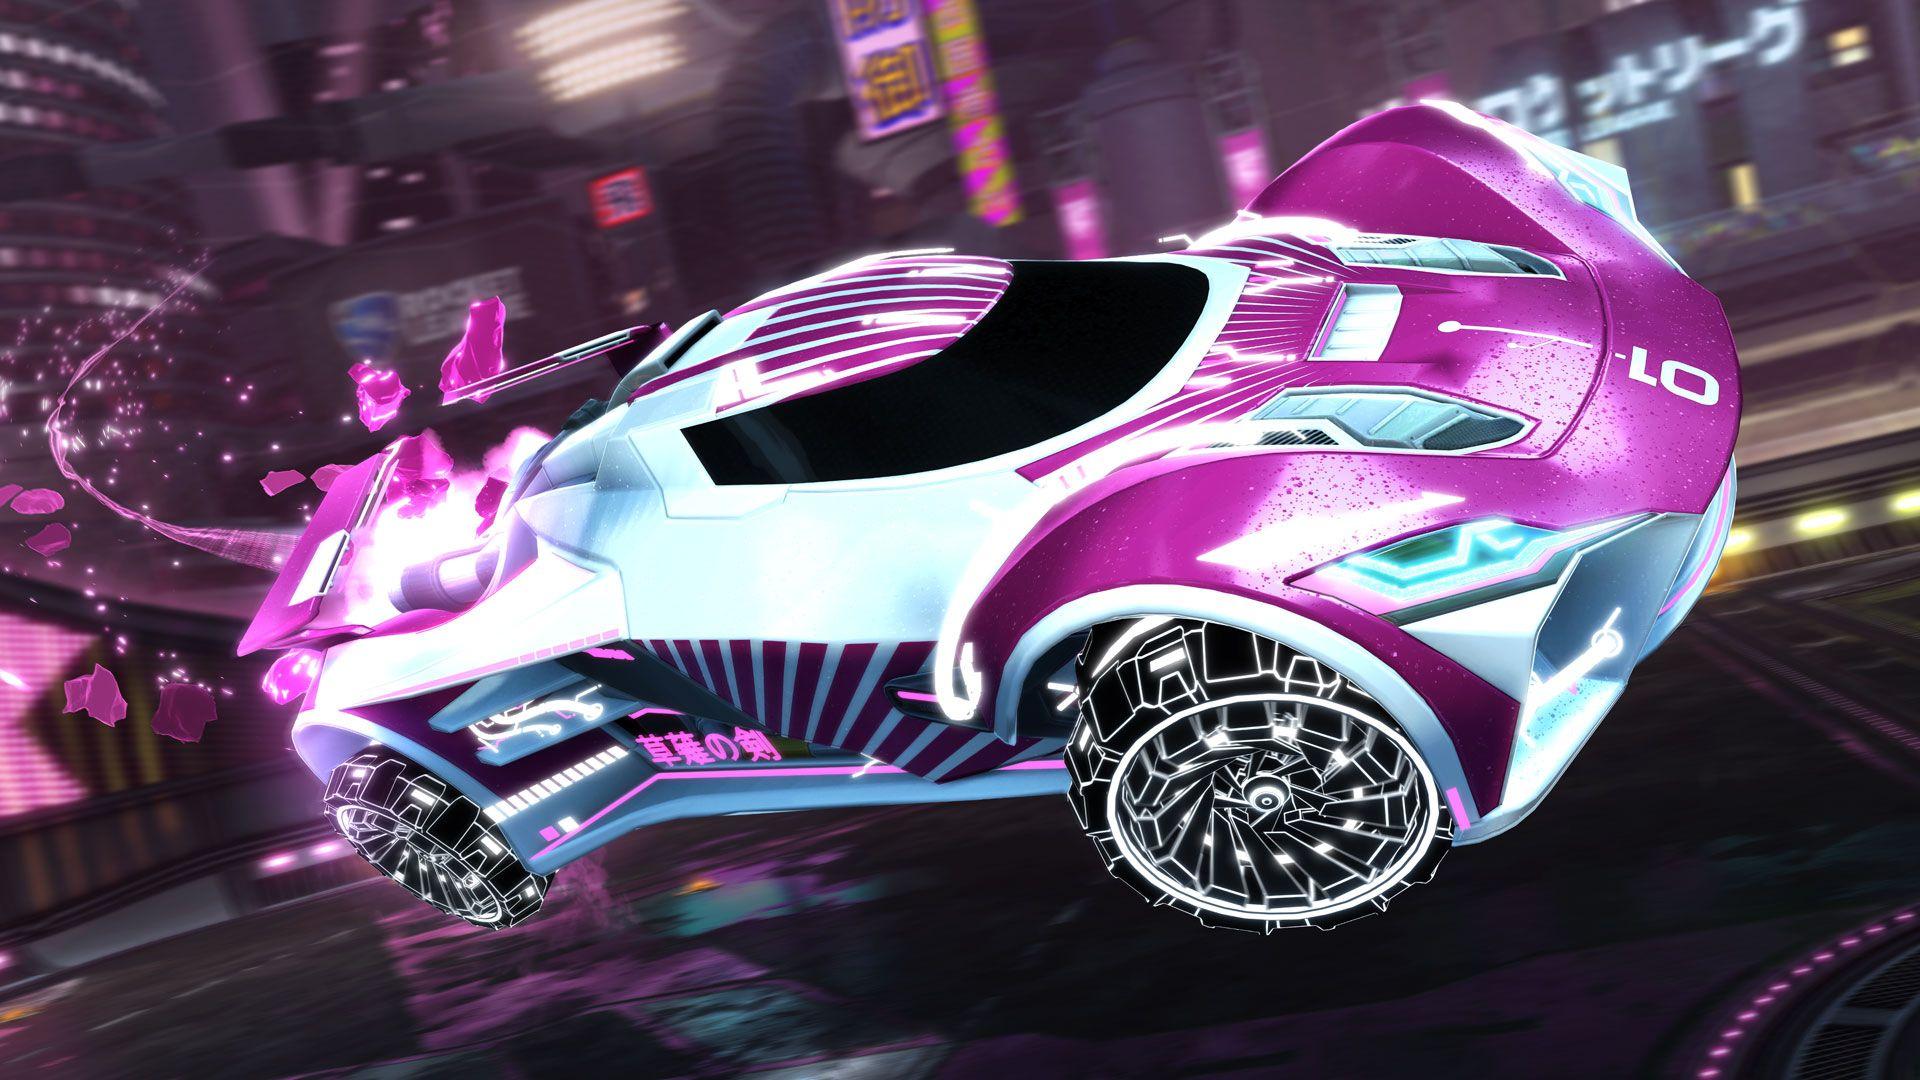 Neo Tokyo has taken over Rocket League in March